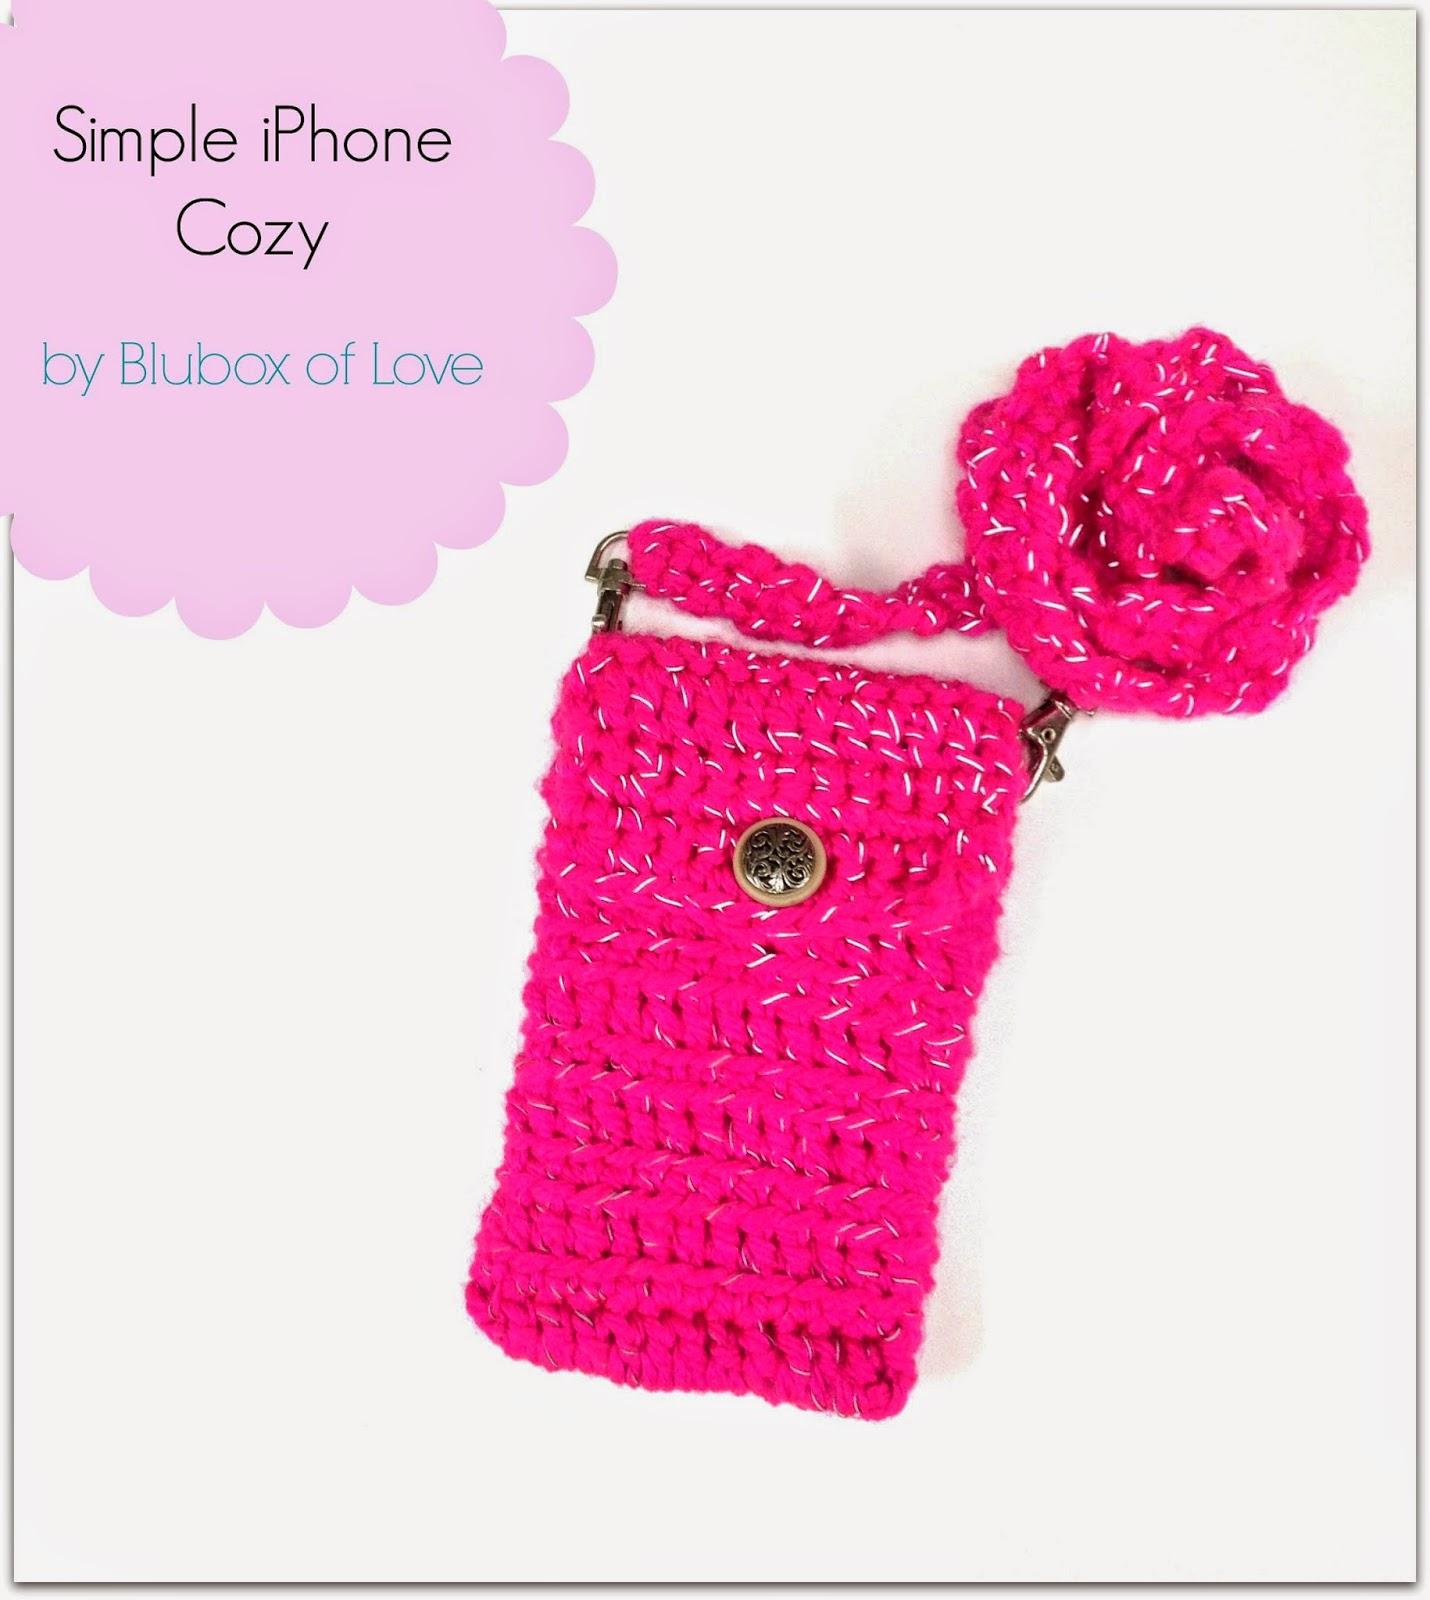 Simple iPhone Cozy